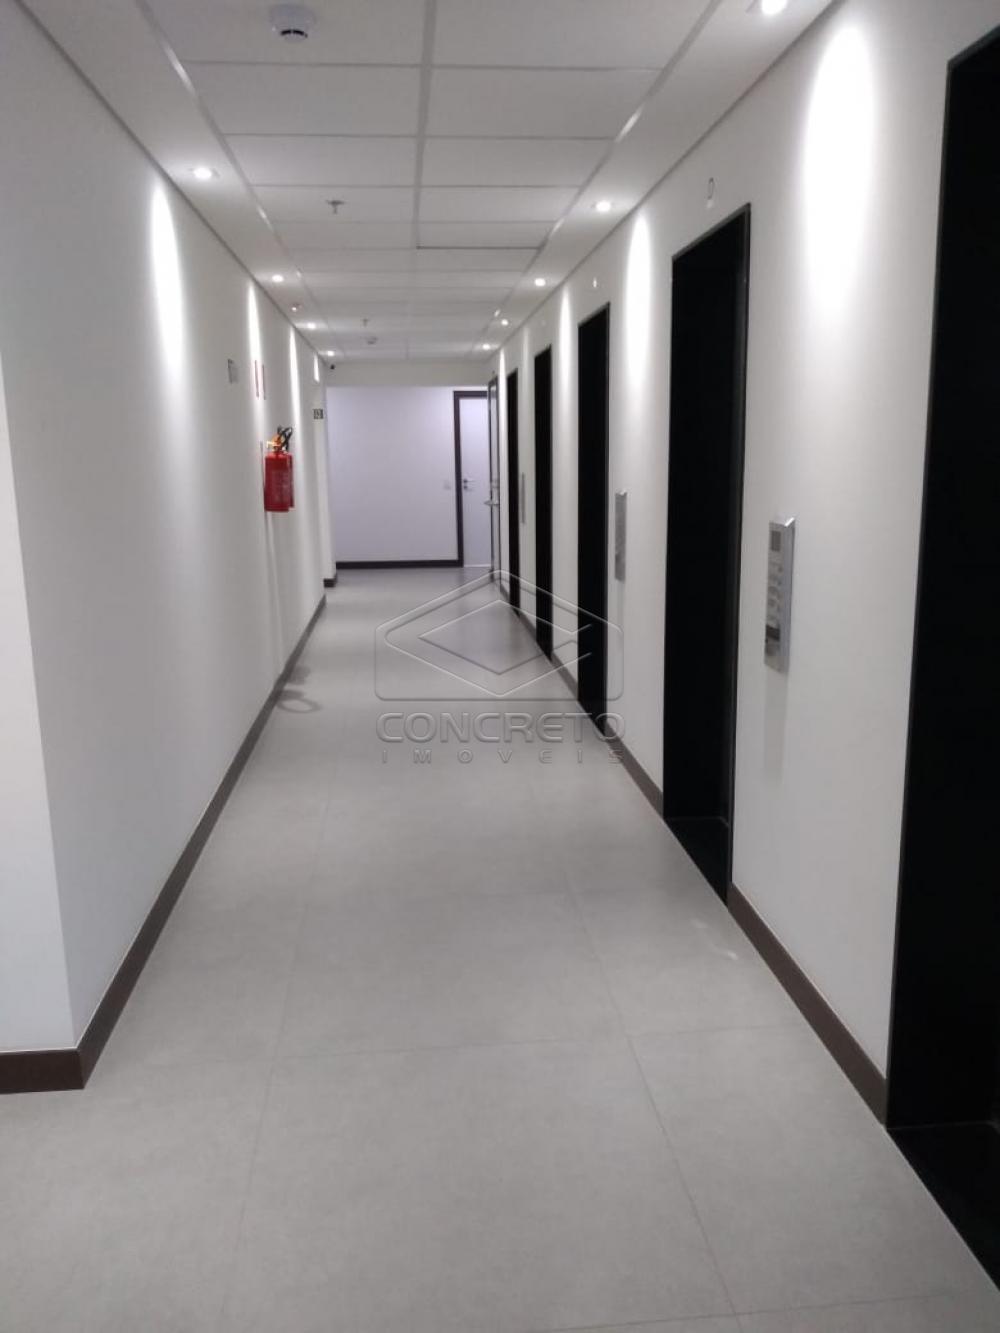 Alugar Comercial / Sala em Bauru R$ 2.600,00 - Foto 4